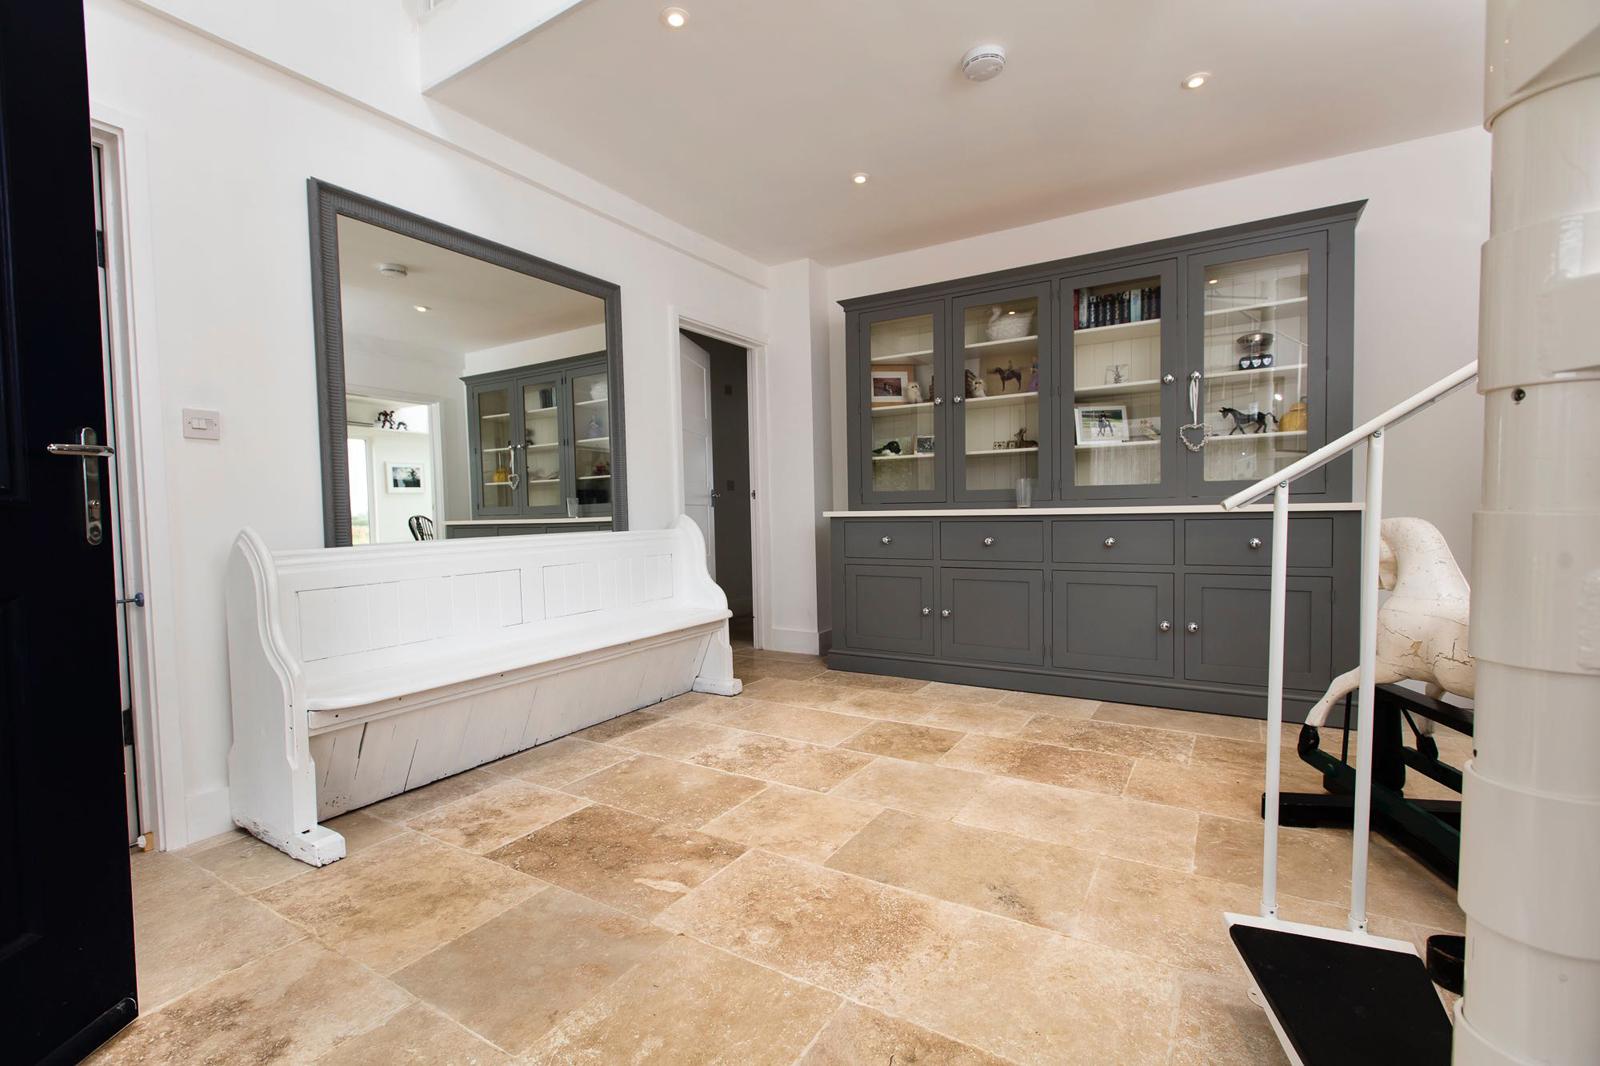 ionian antiqued travertine floor tile dt stone tile shop in fordingbridge